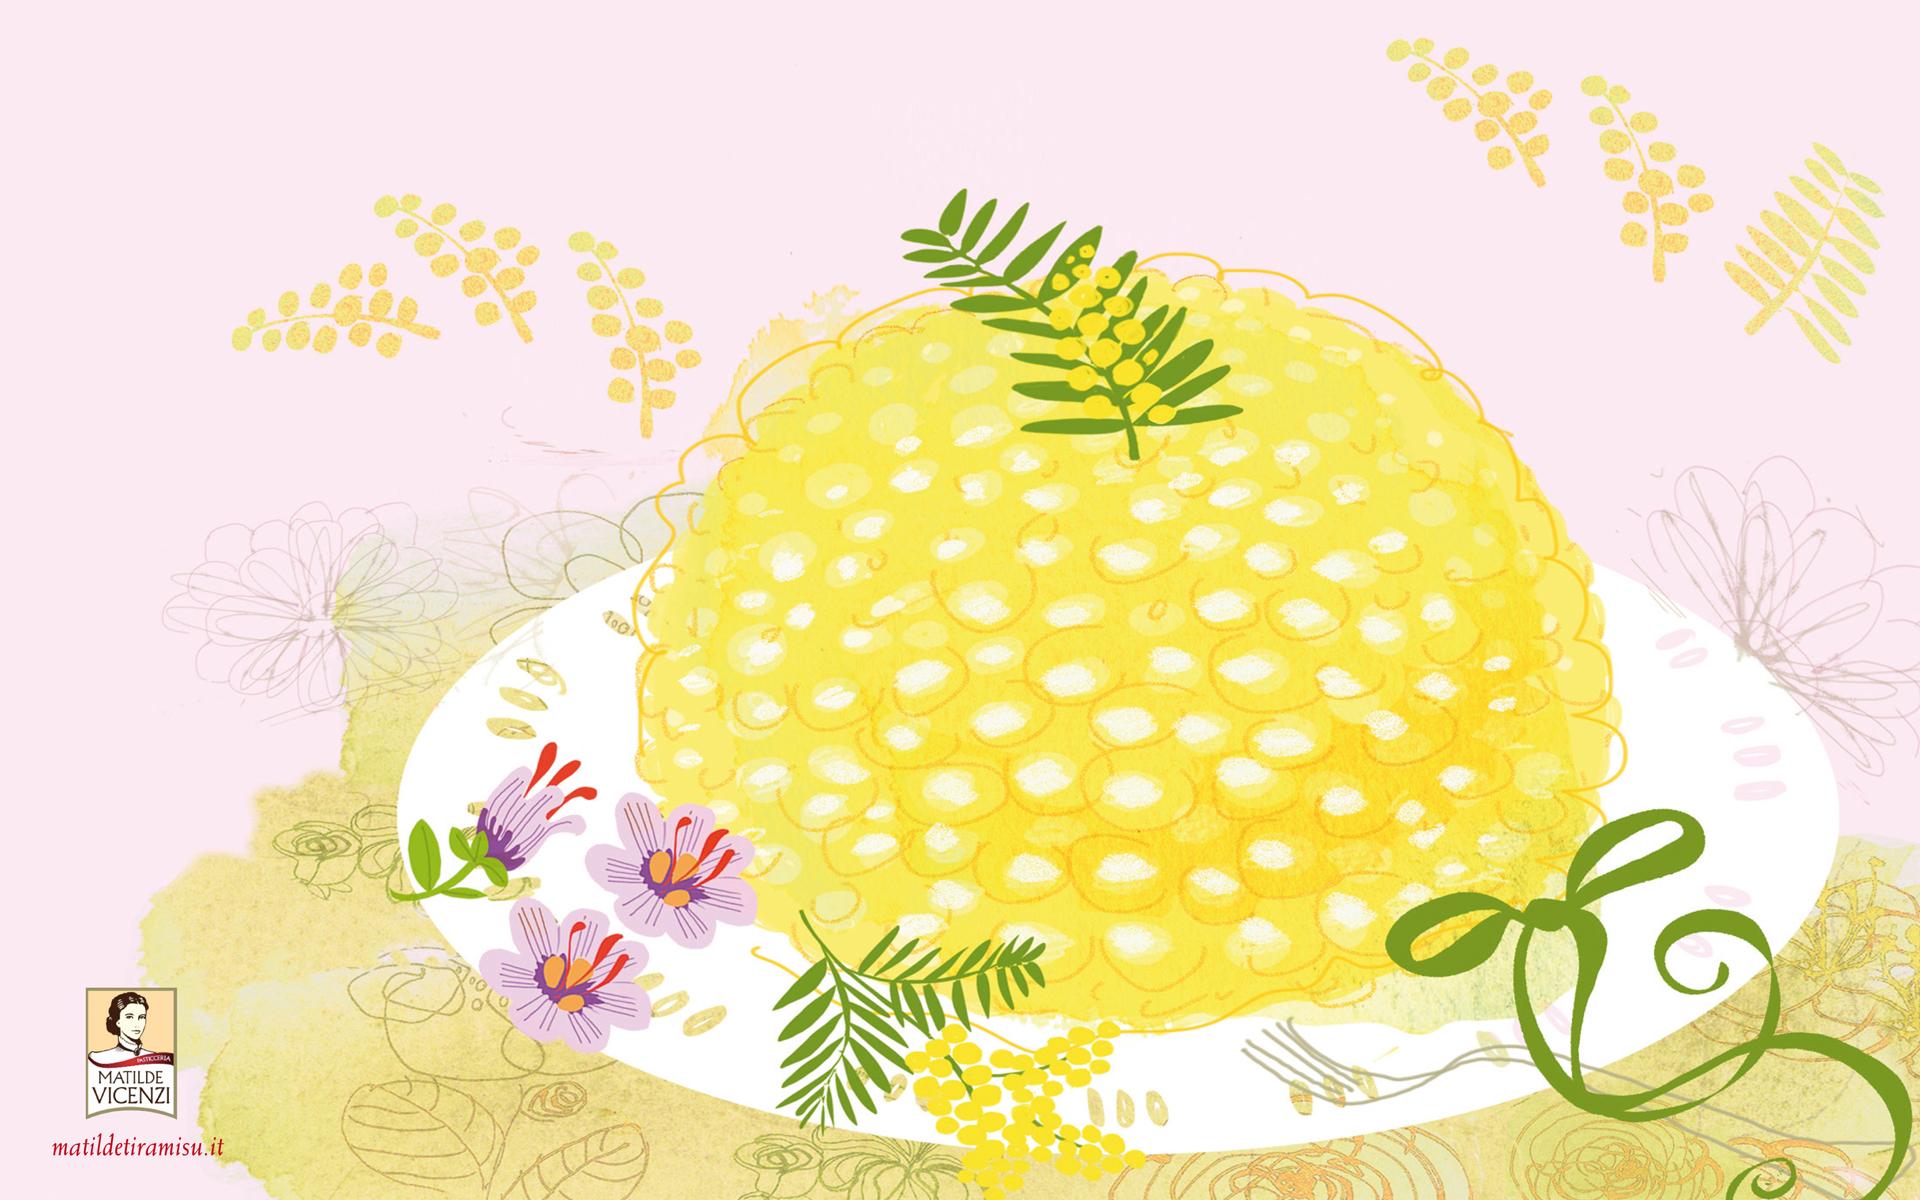 Sfondo PC ricetta torta - MatildeTiramiSu